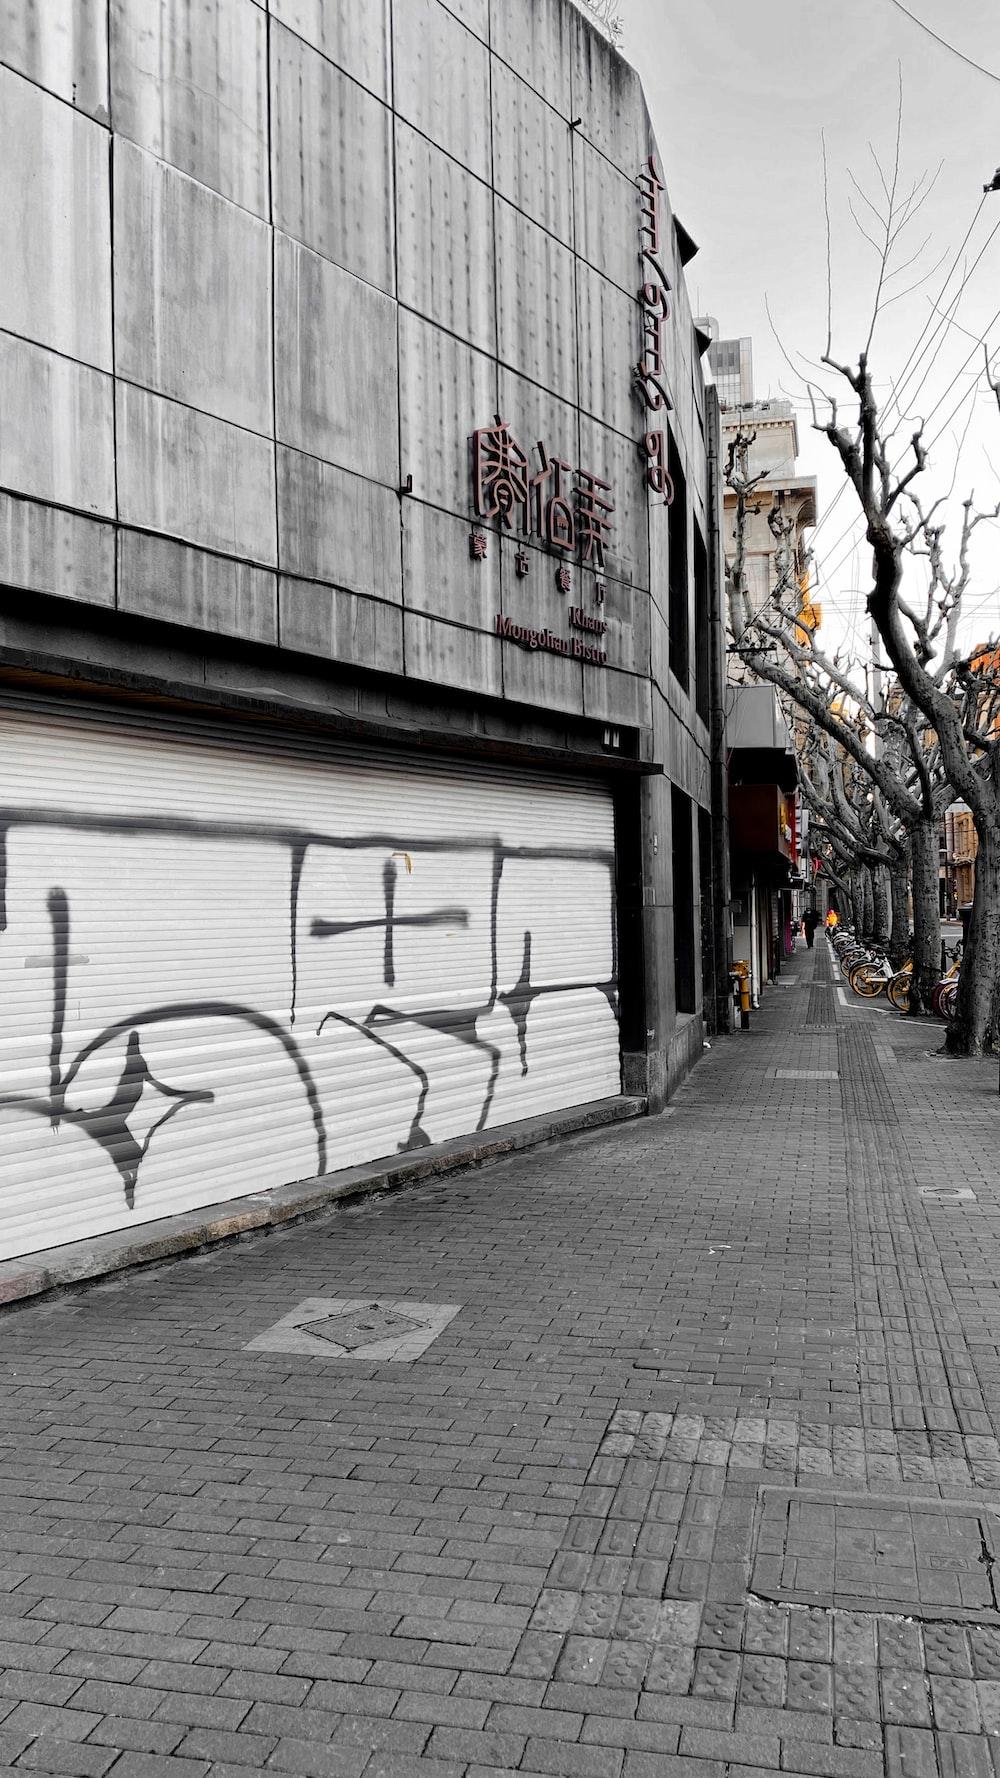 white and red wall graffiti